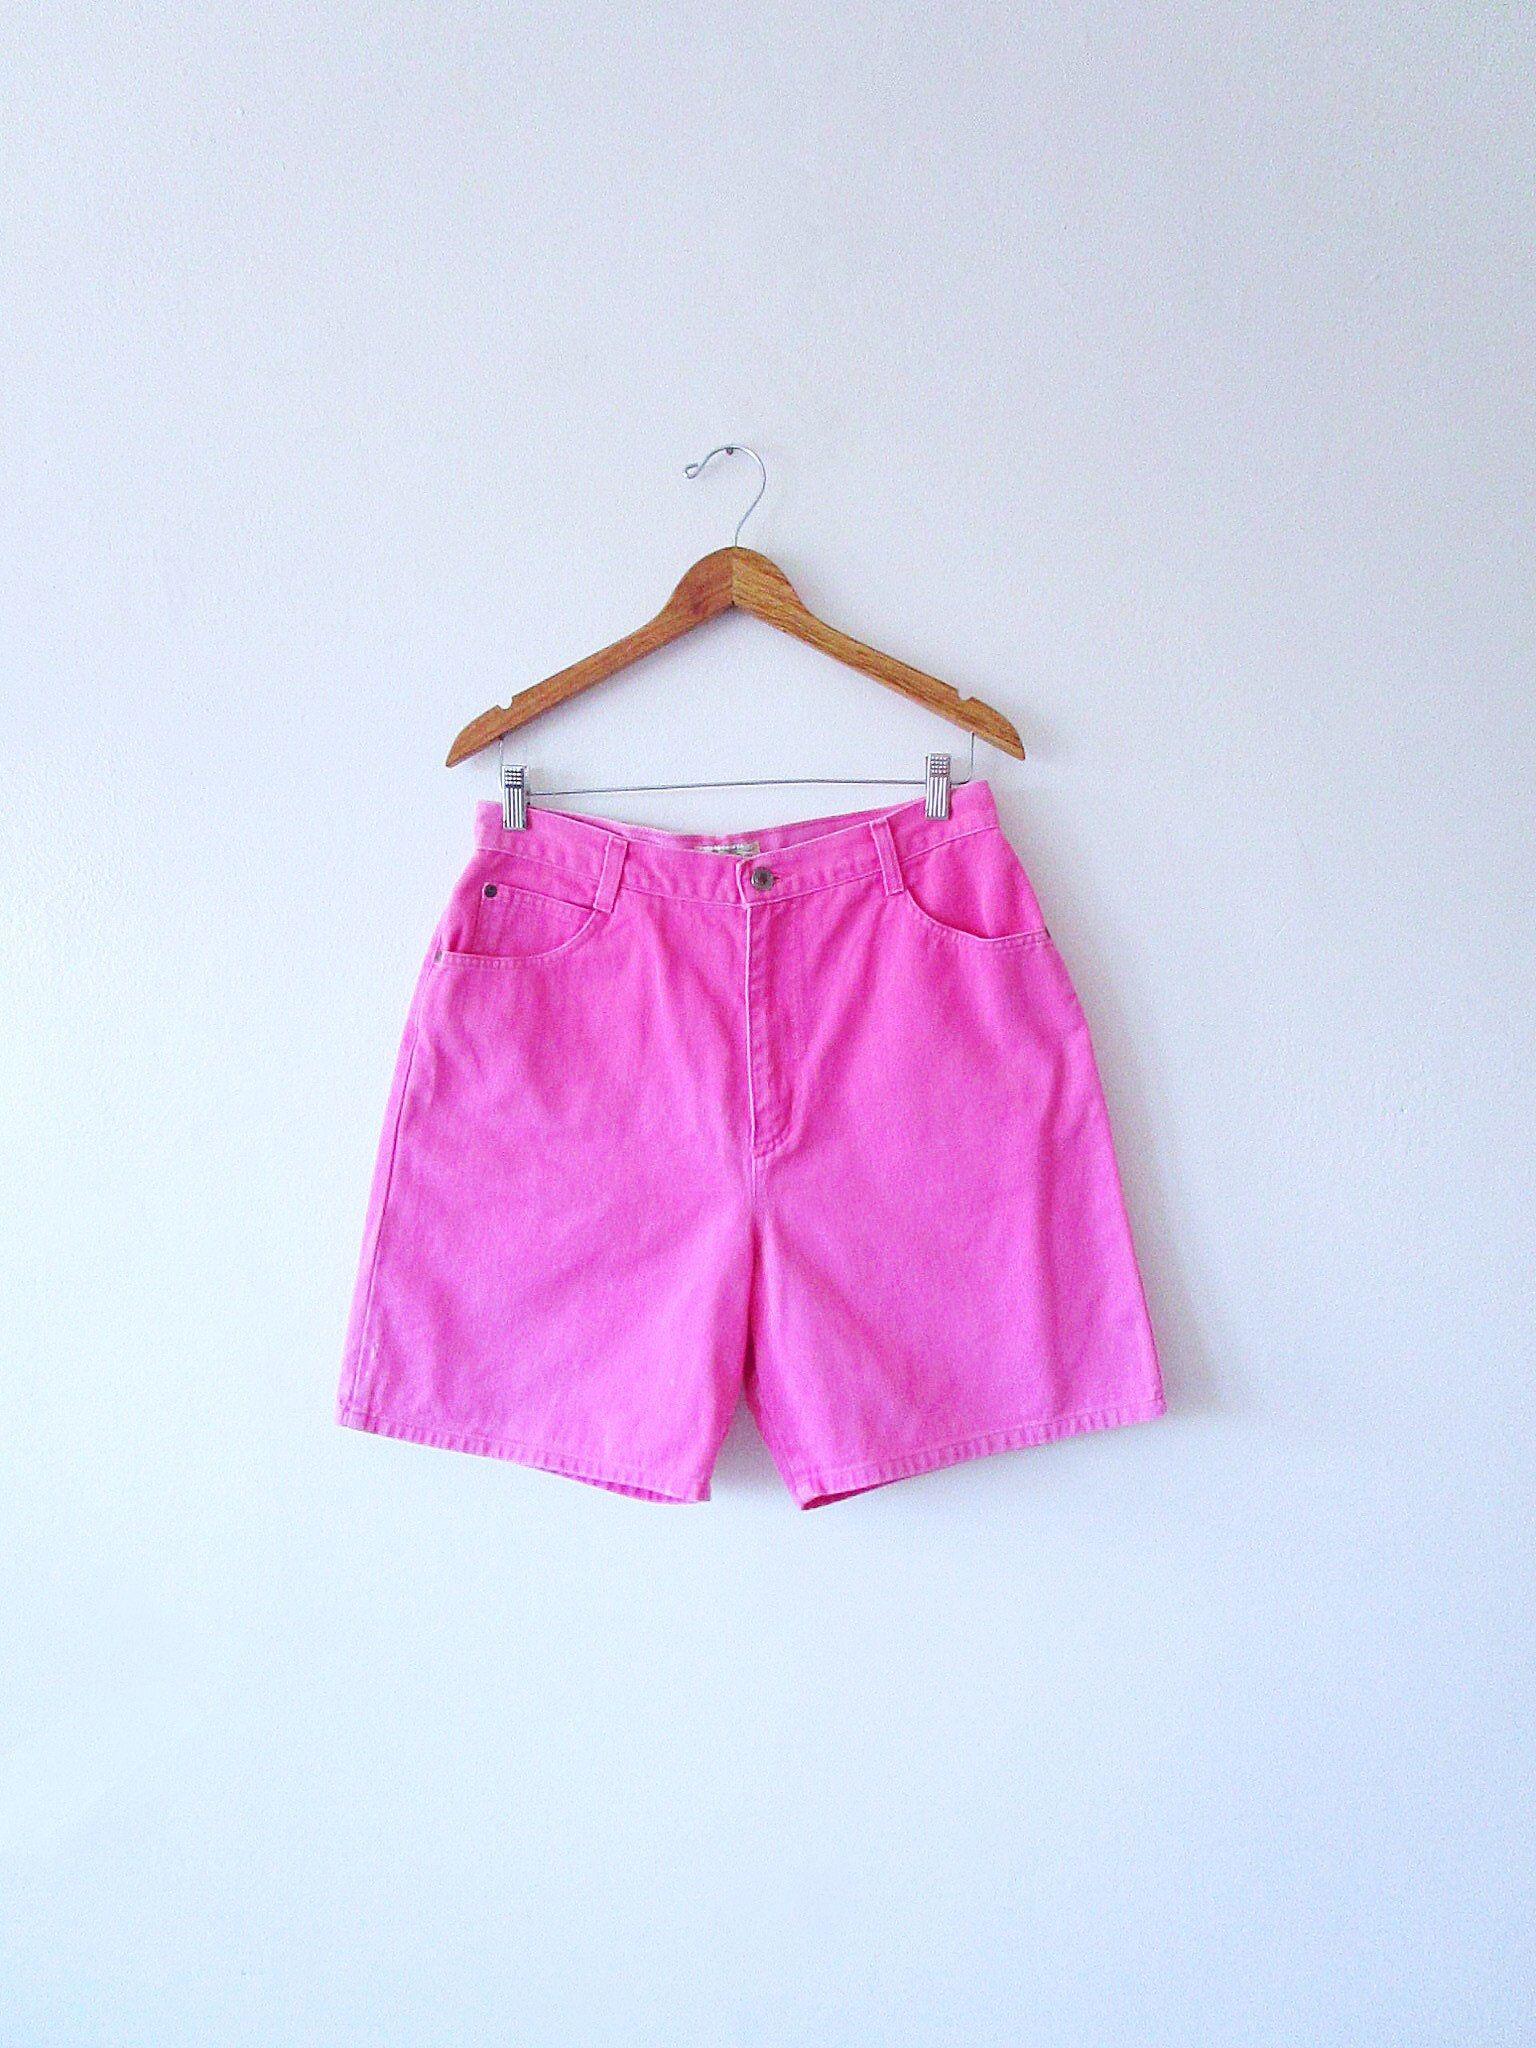 a56cca38e4a Wms Vintage 90 s High Waisted PINK Denim St. John s Bay Jean Shorts ...